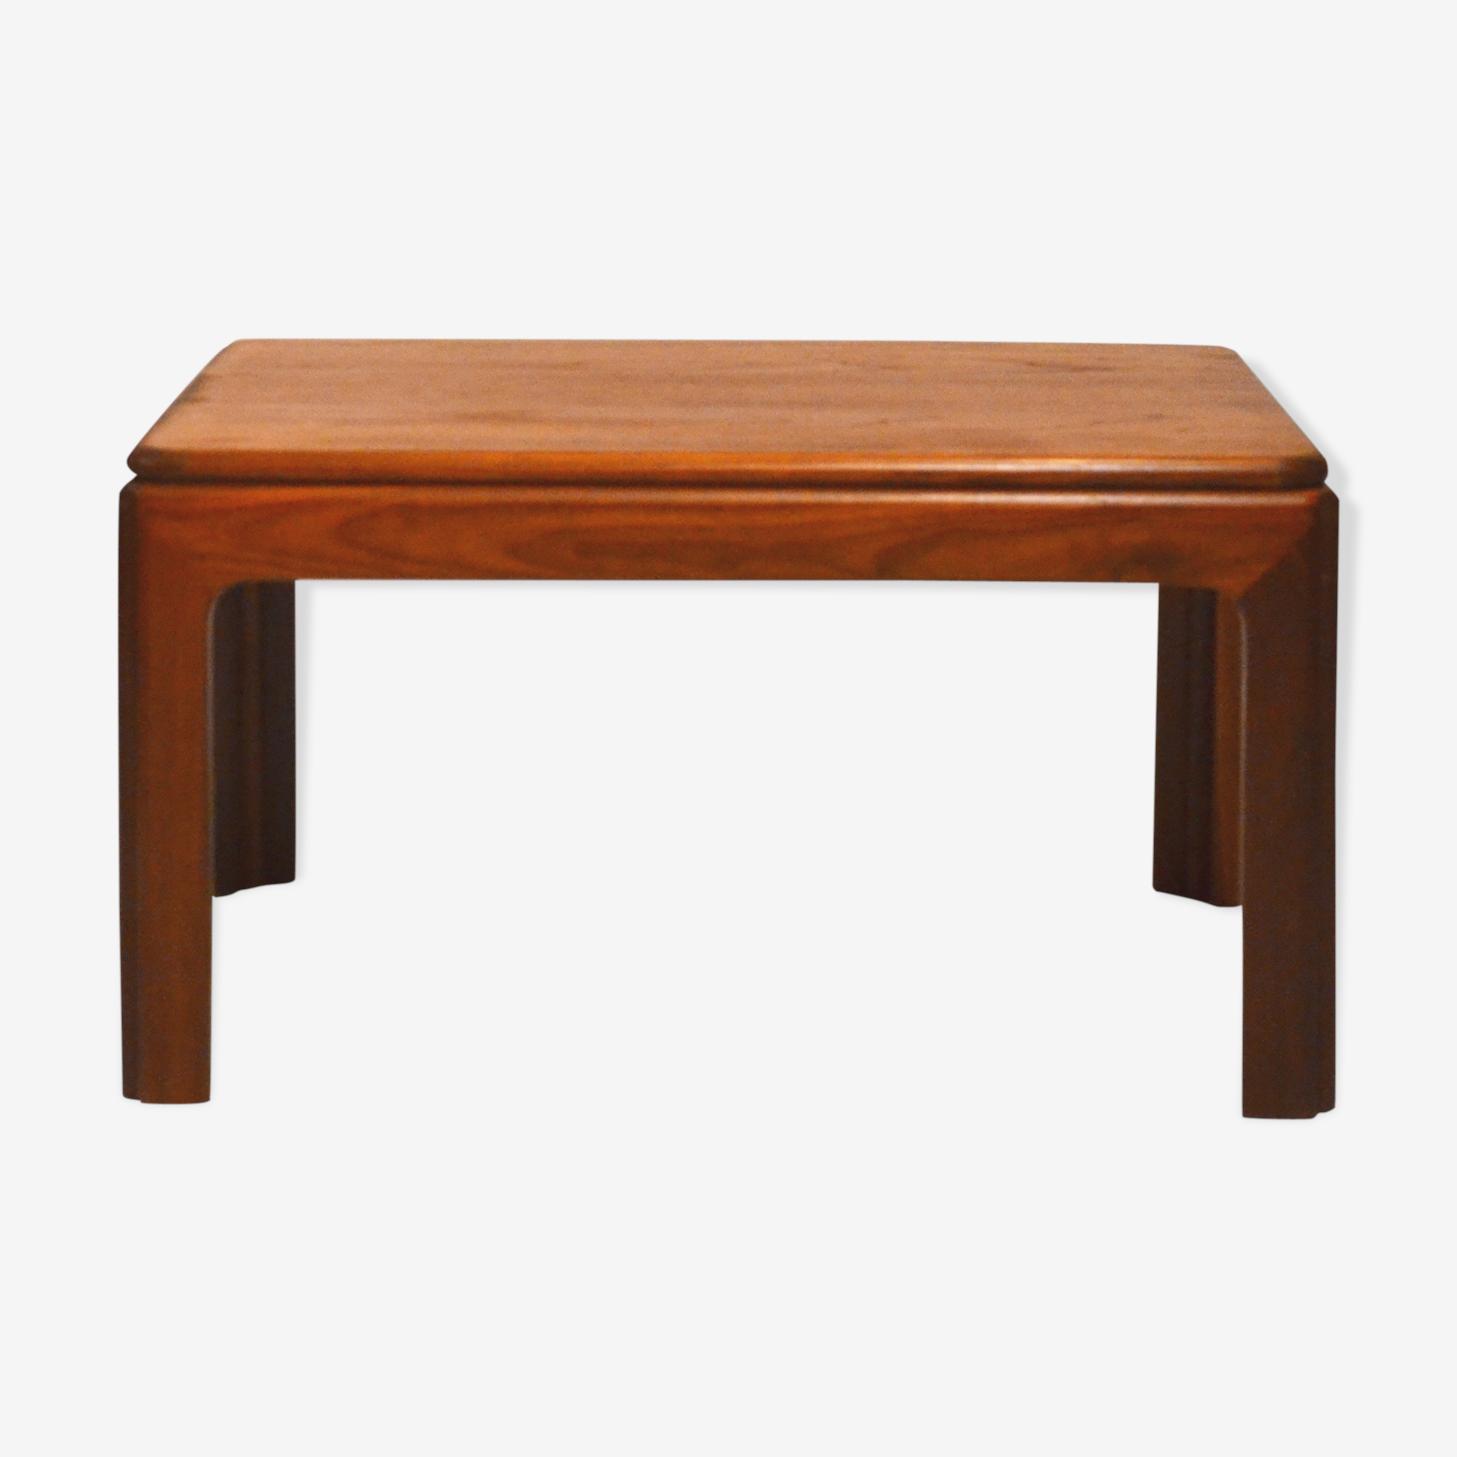 Table basse GPlan années 60